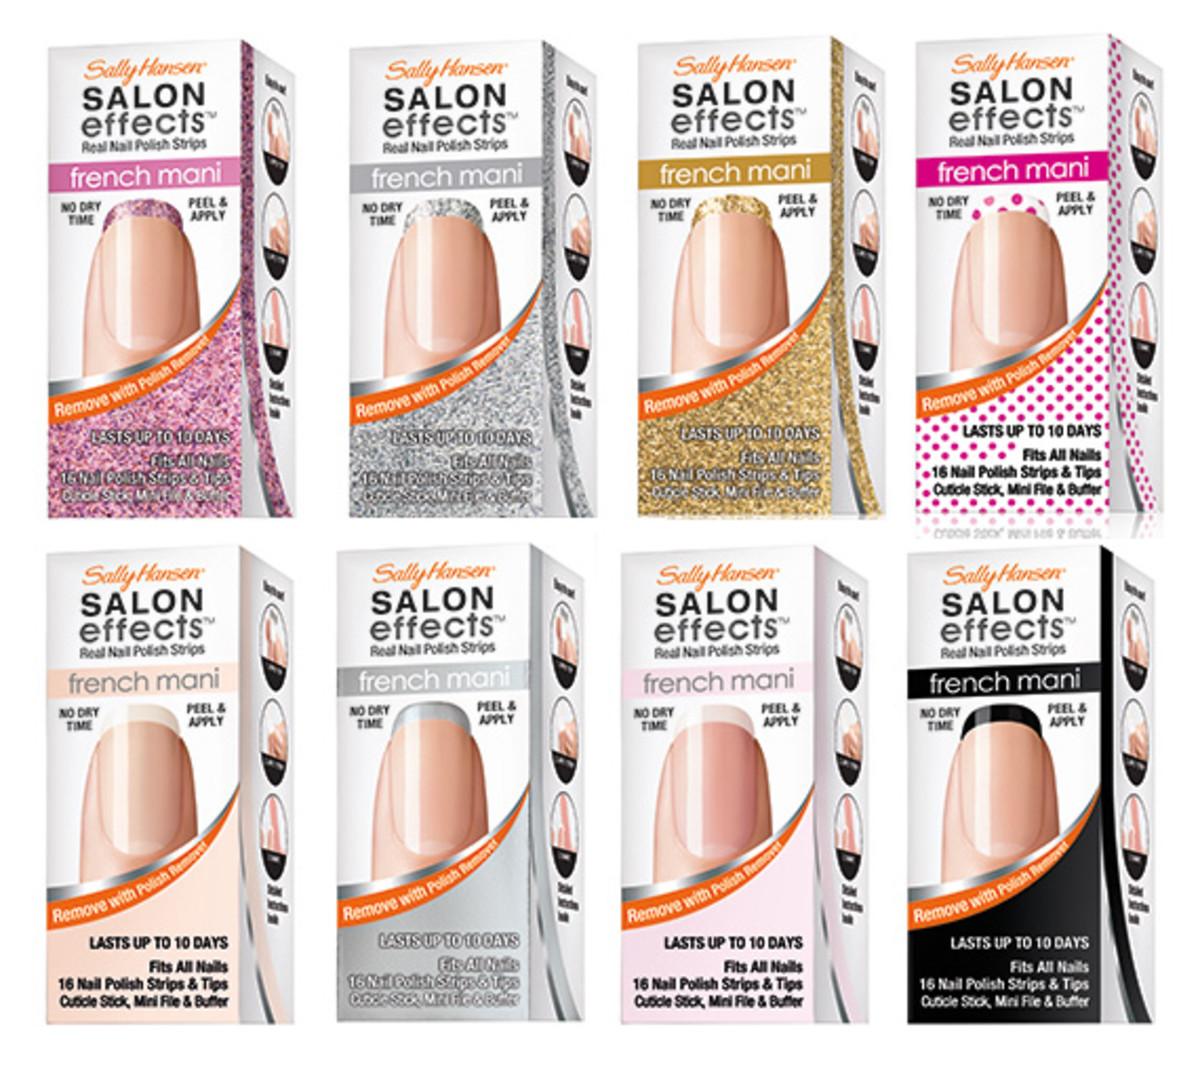 Sally Hansen Salon Effects French Mani